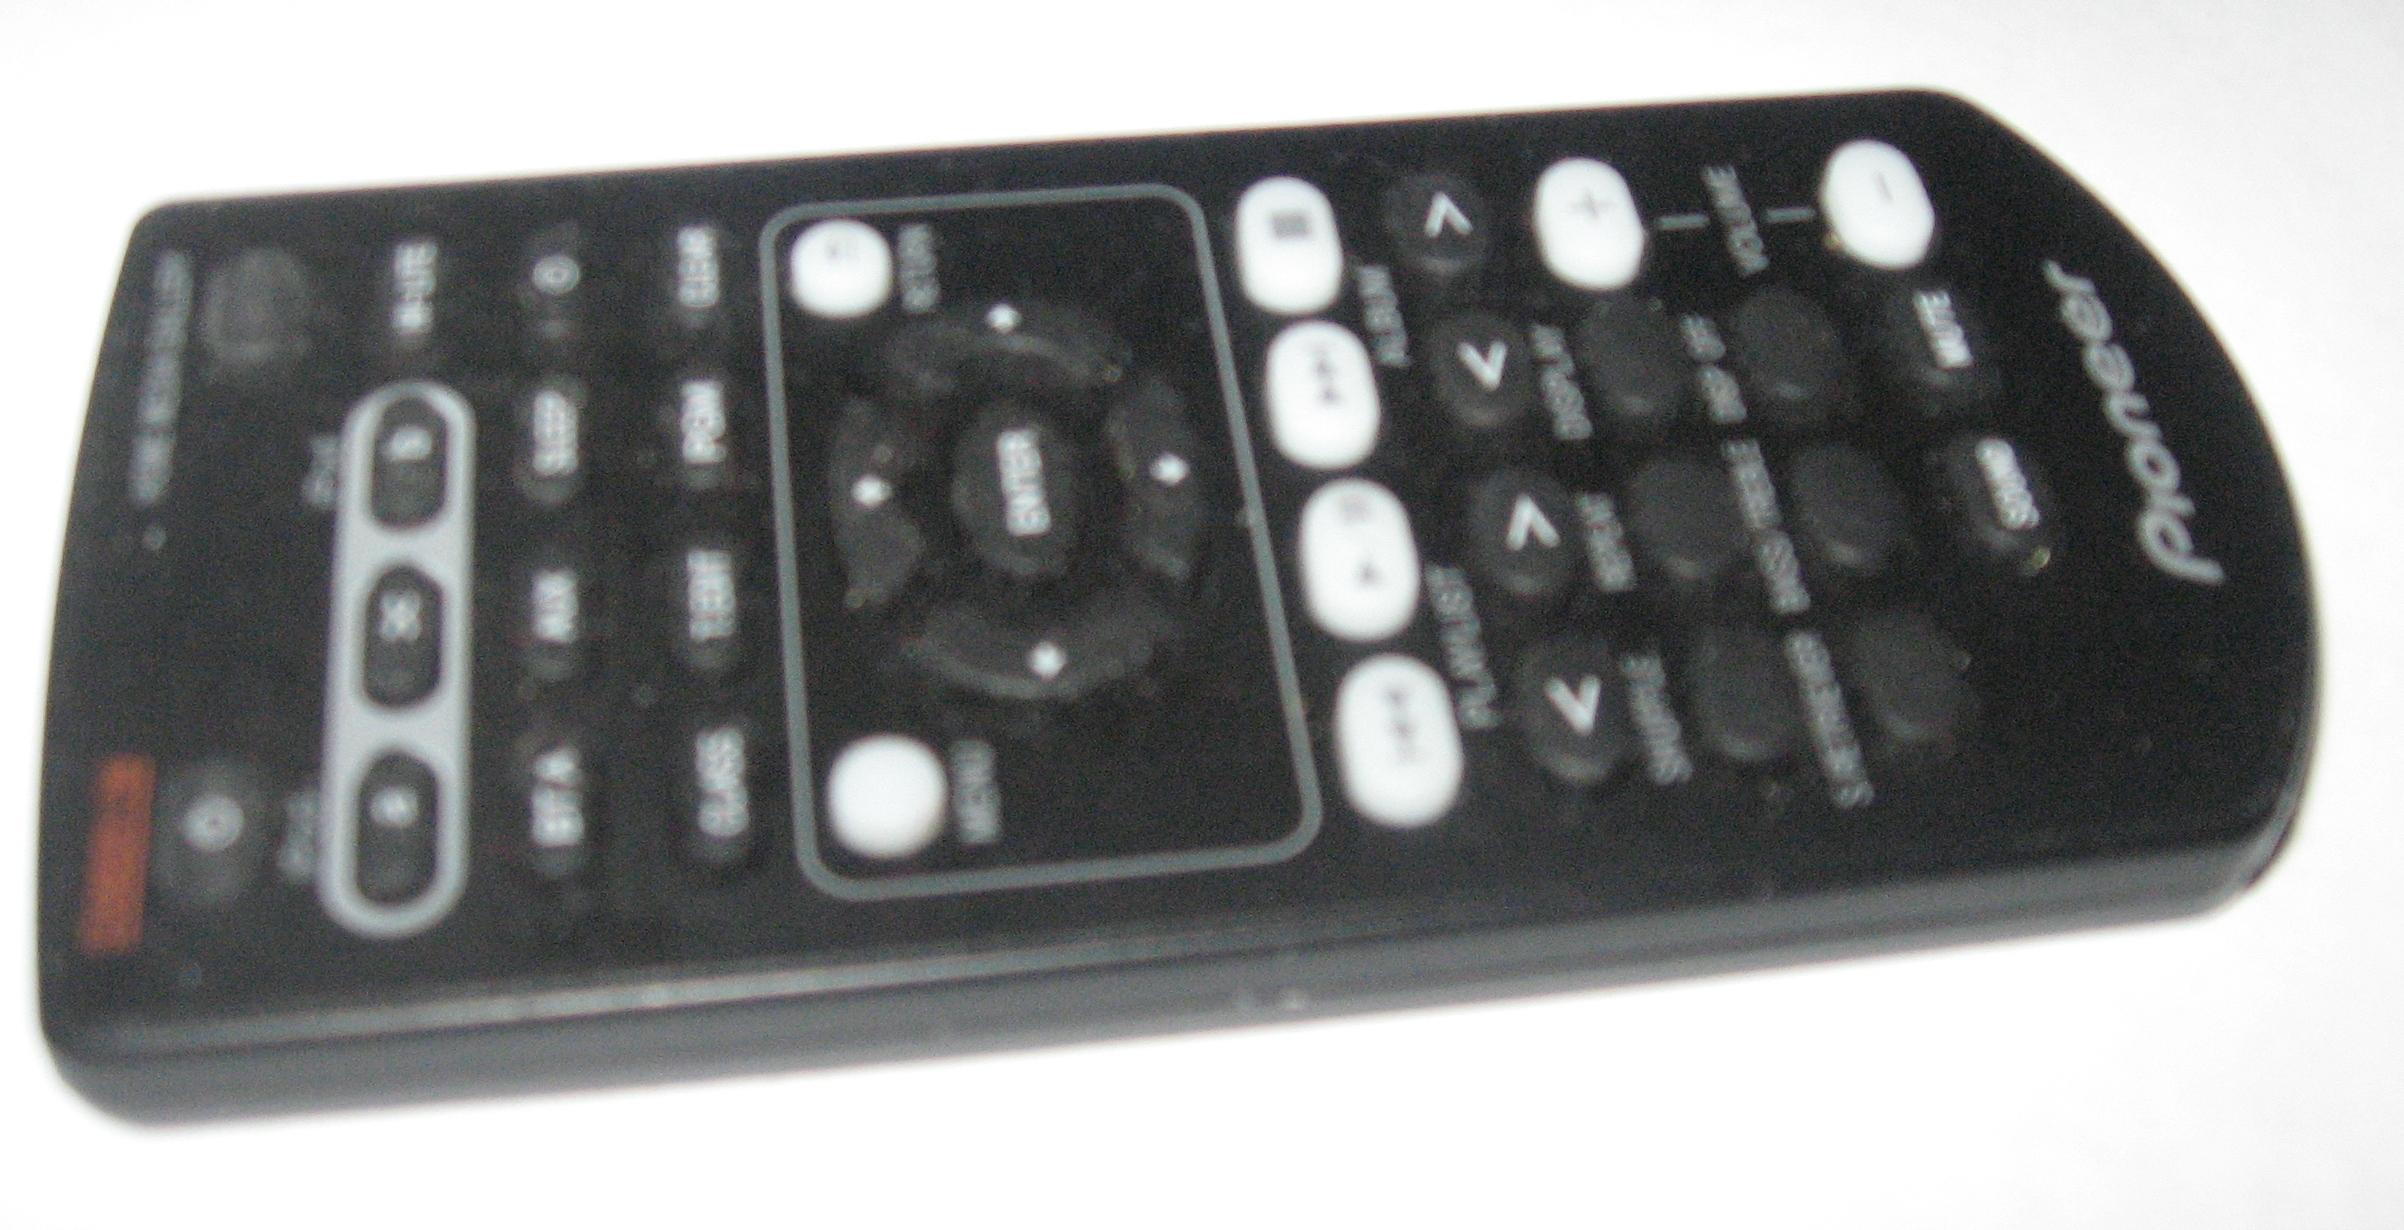 Pioneer XW-NAC3 remote control